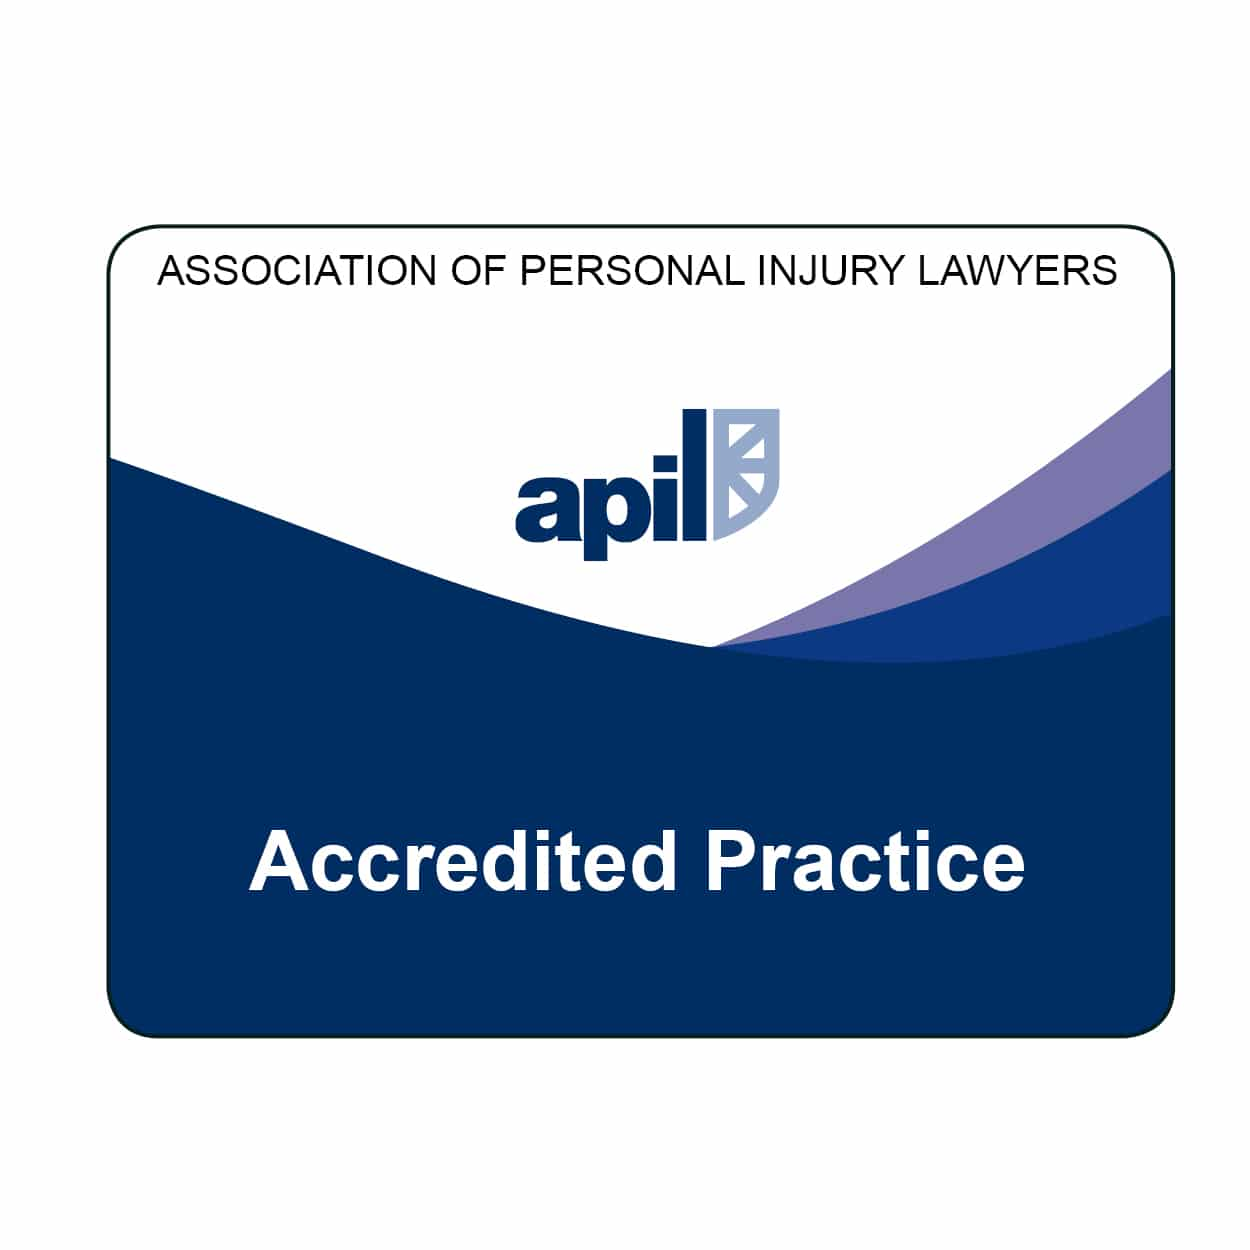 apil-practice